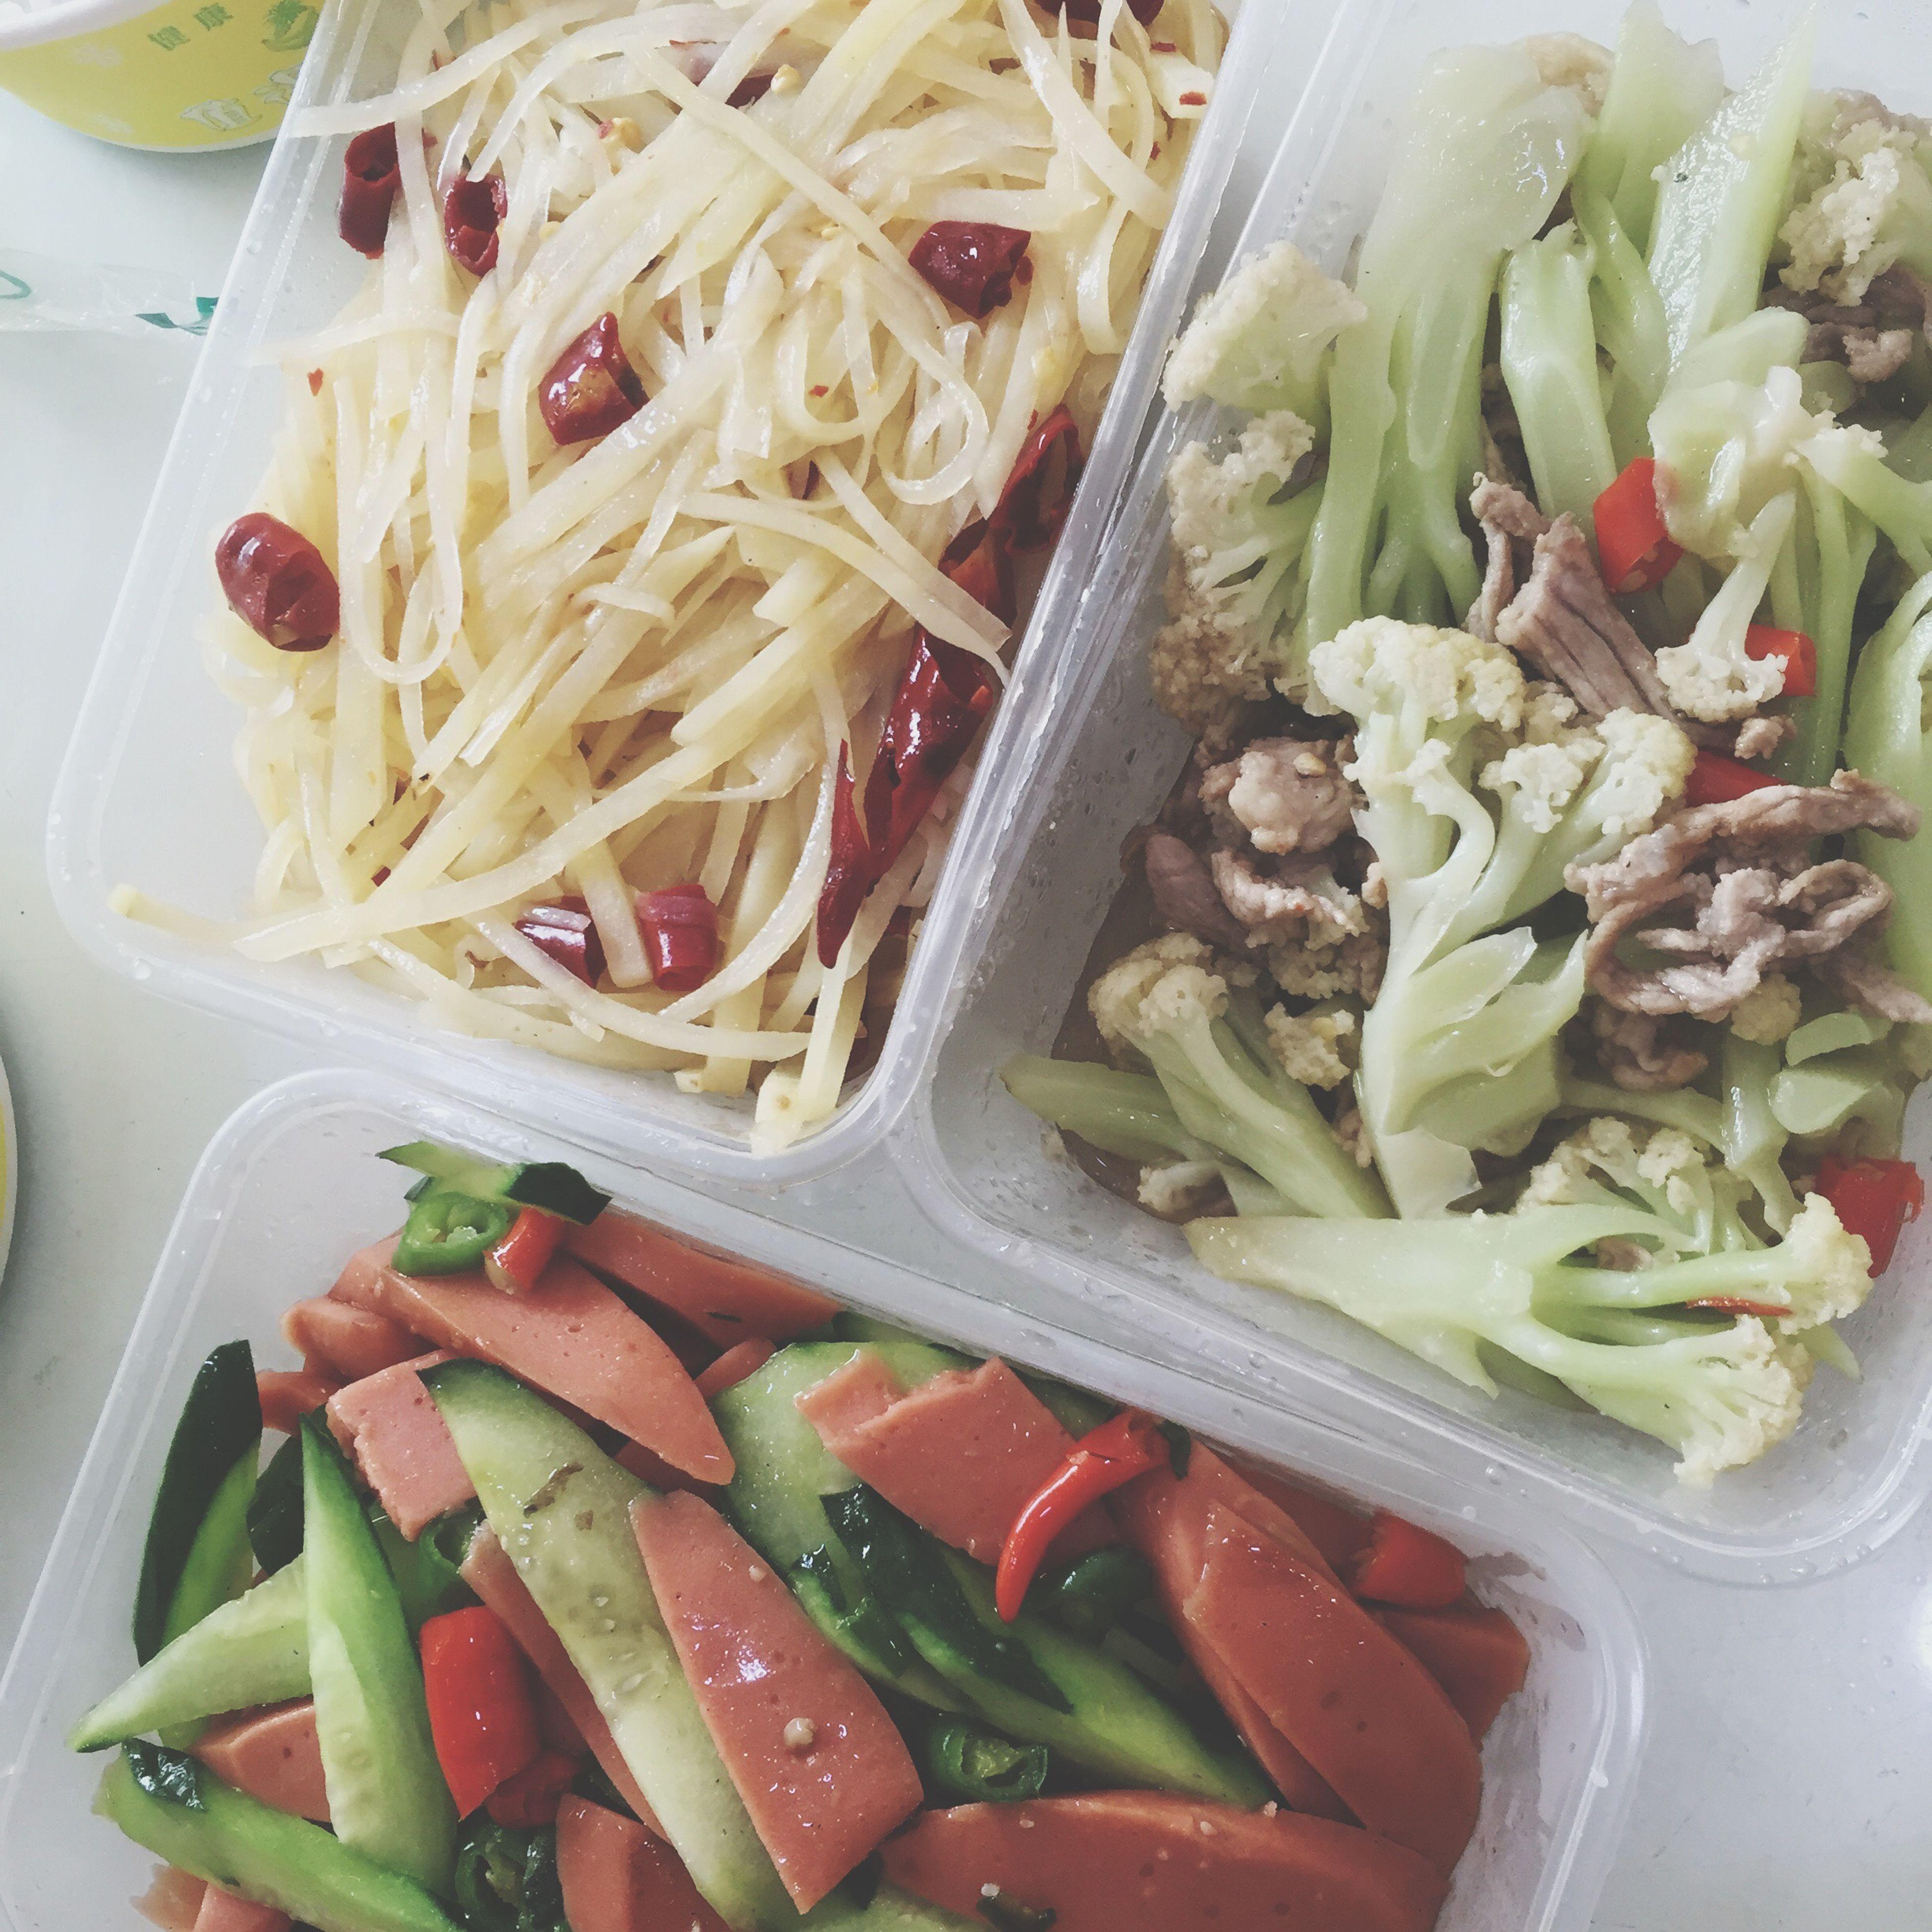 food, freshness, ready-to-eat, still life, close-up, meal, serving size, bowl, indulgence, no people, cabbage, full frame, leaf vegetable, served, abundance